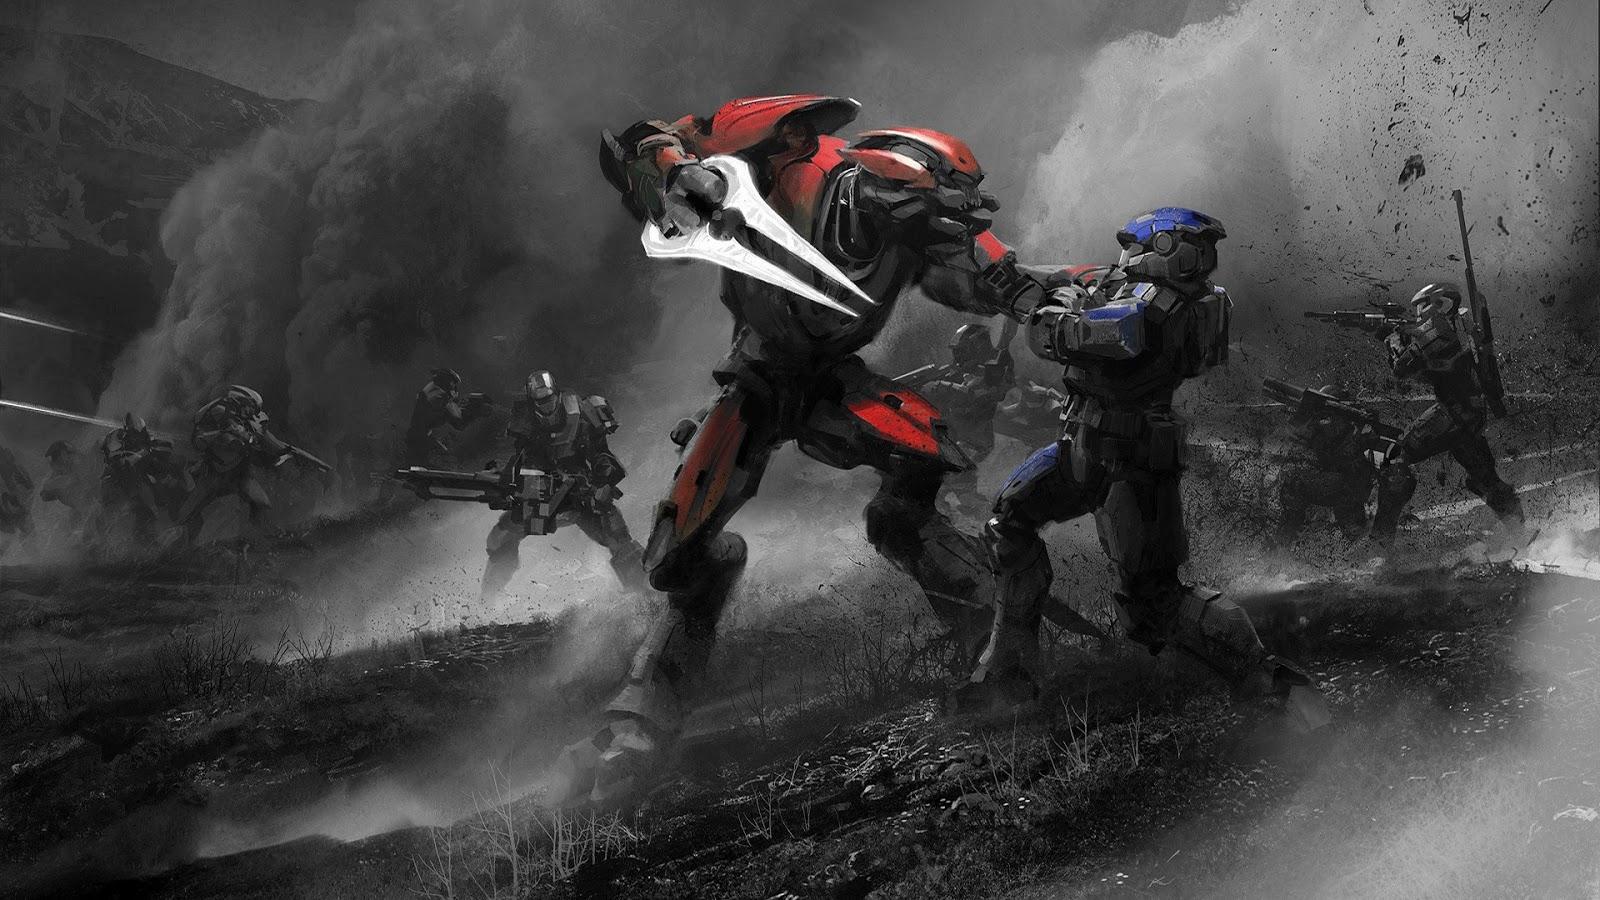 Fondos de pantalla de Halo 4 DragonXoft 1600x900